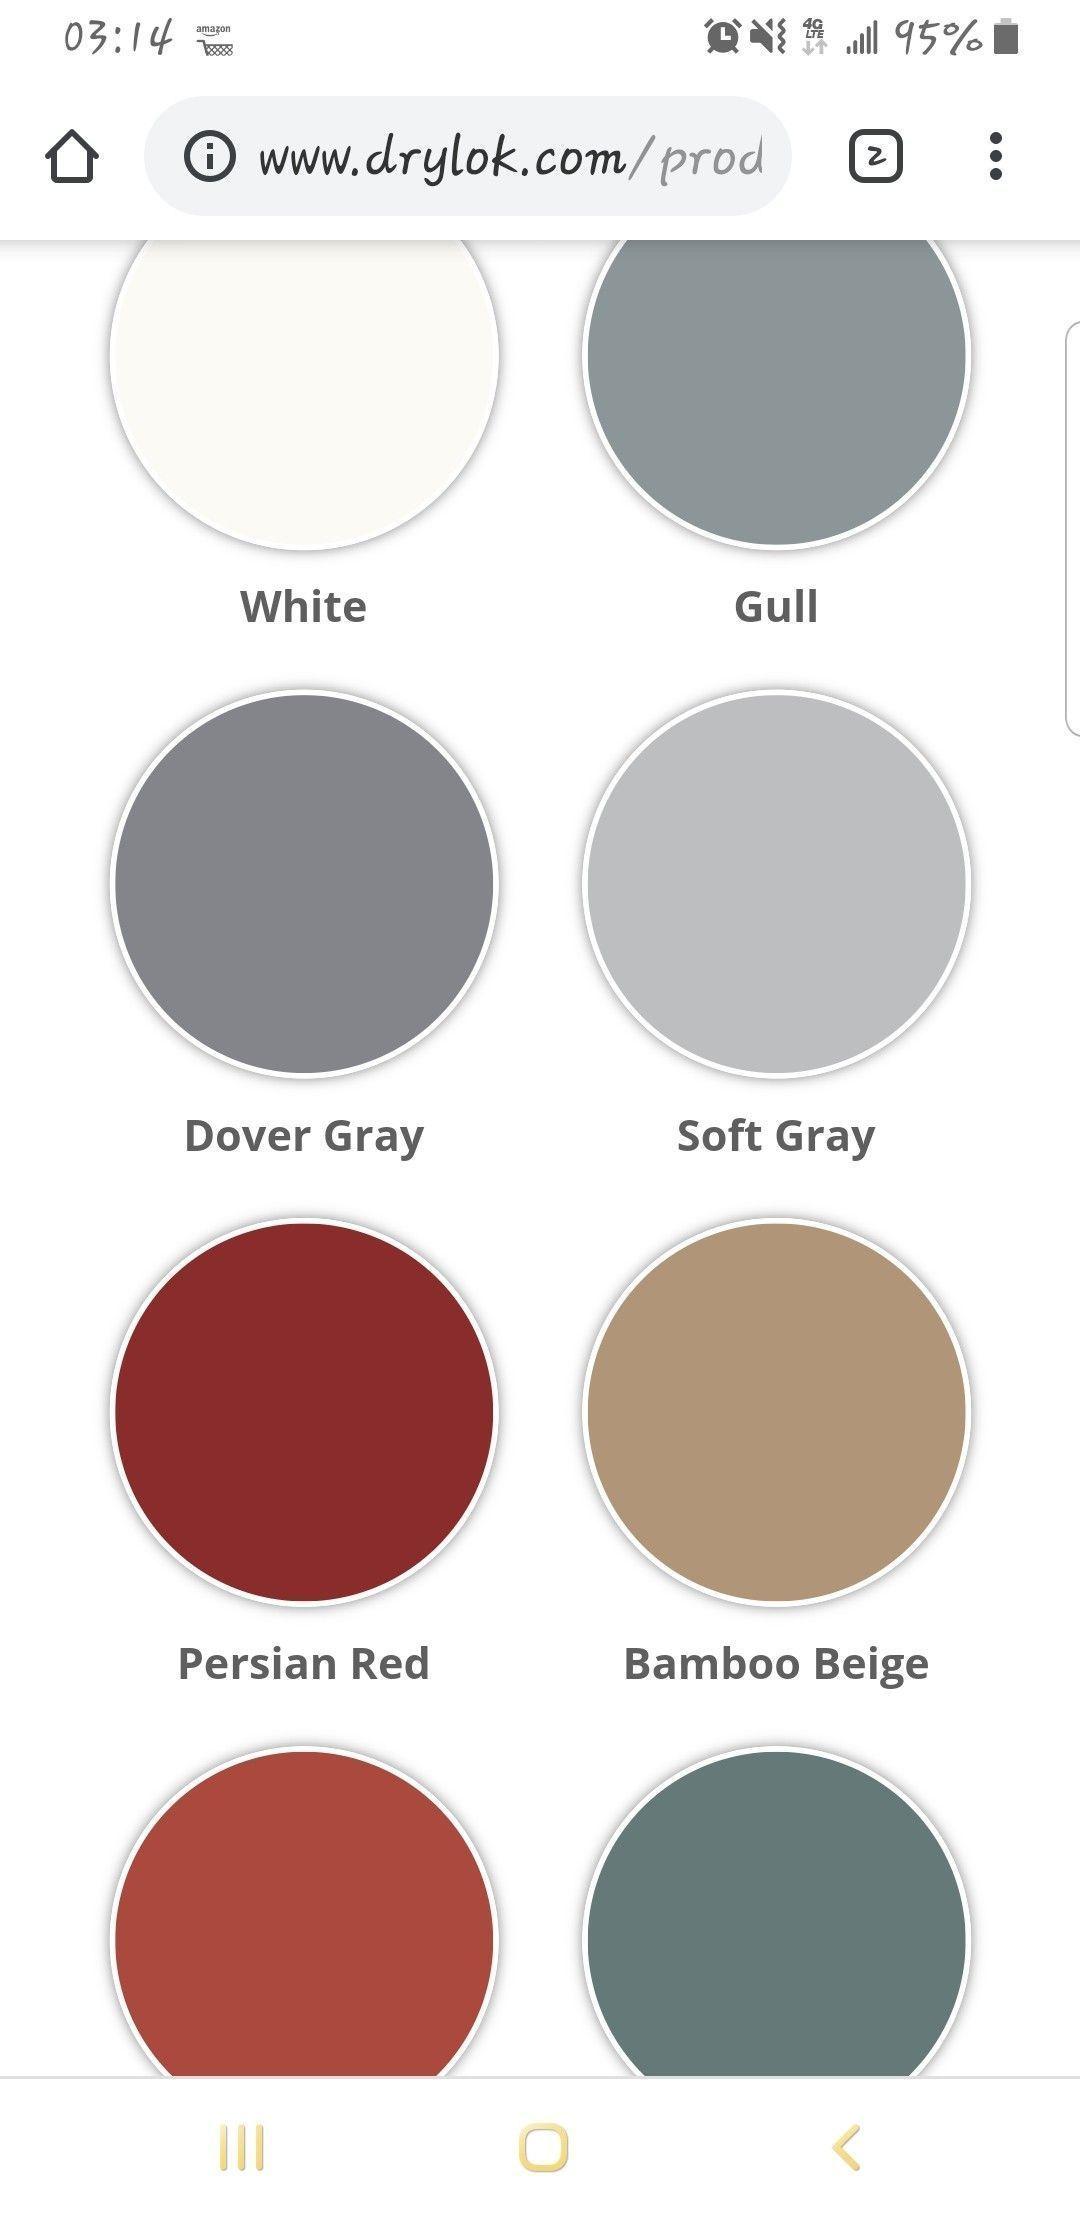 Drylok latex basement floor paint color options - elsesun ...